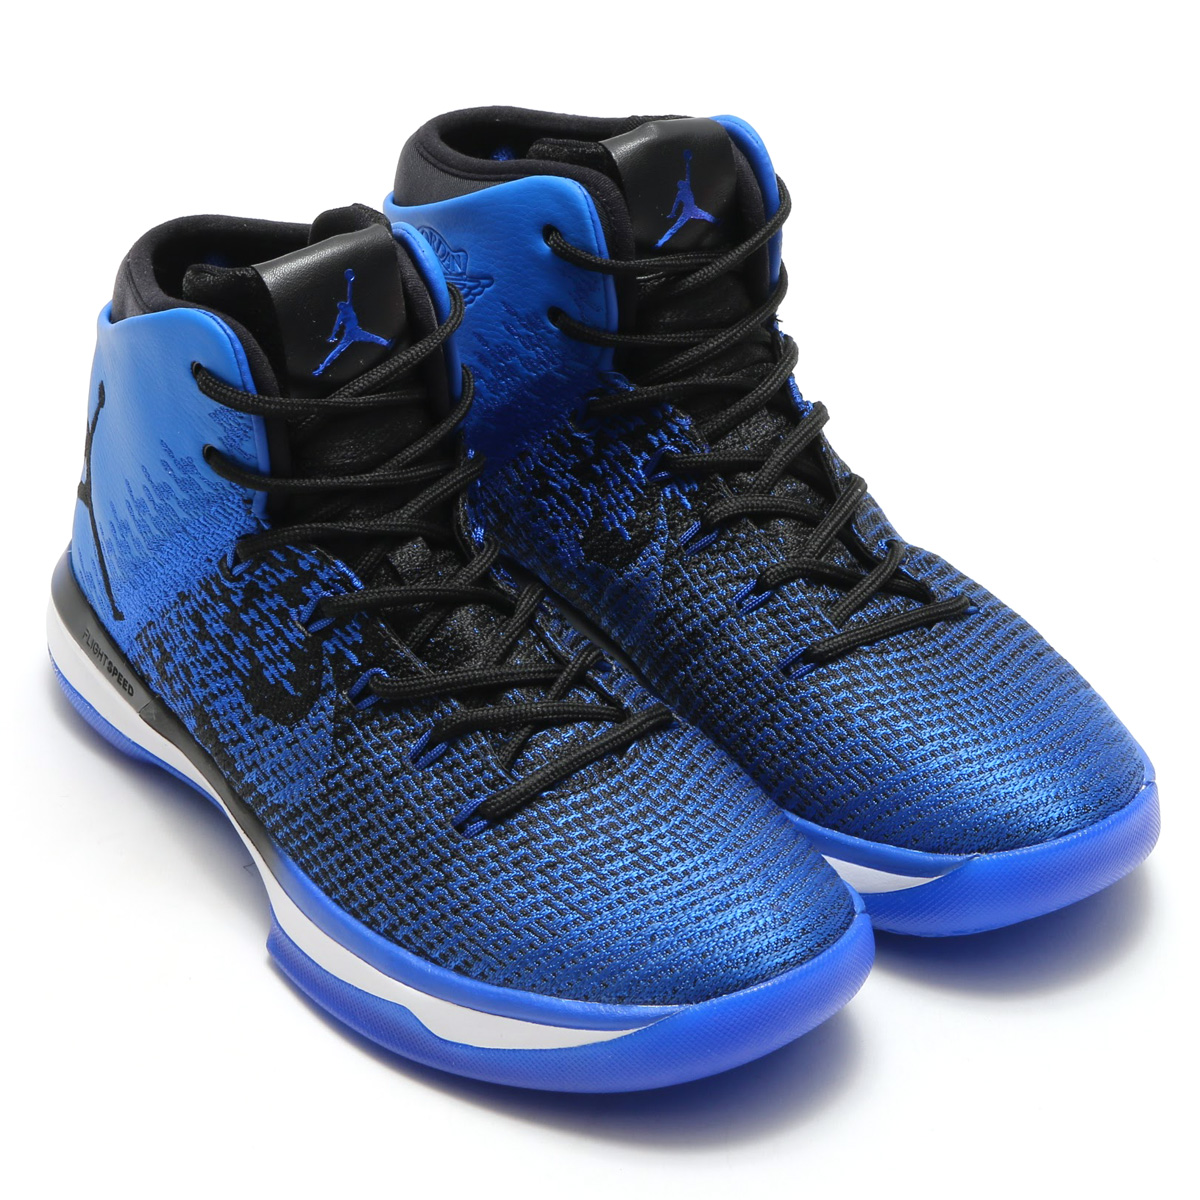 NIKE AIR JORDAN XXXI (Nike Air Jordan XXXI) BLACK/GAME ROYAL-WHITE 17SU-S